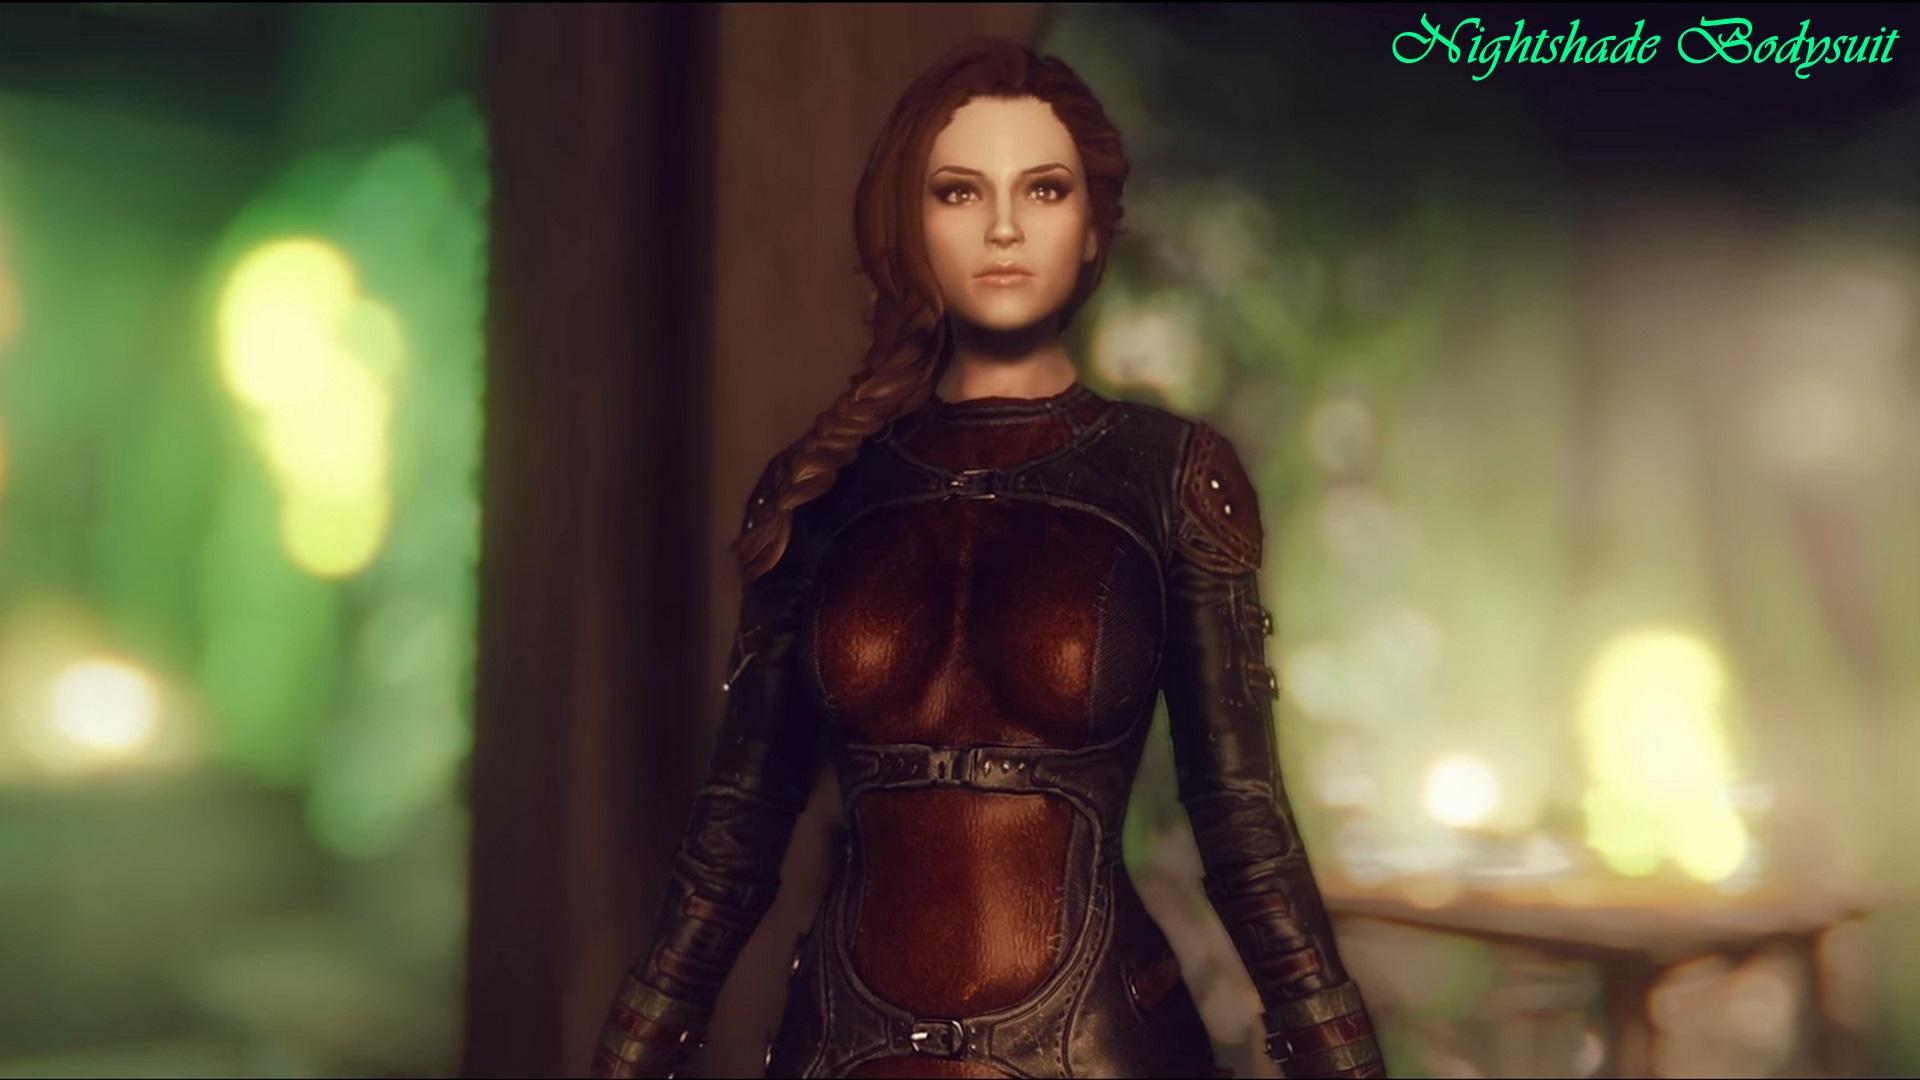 Nightshade Bodysuit 01.jpg